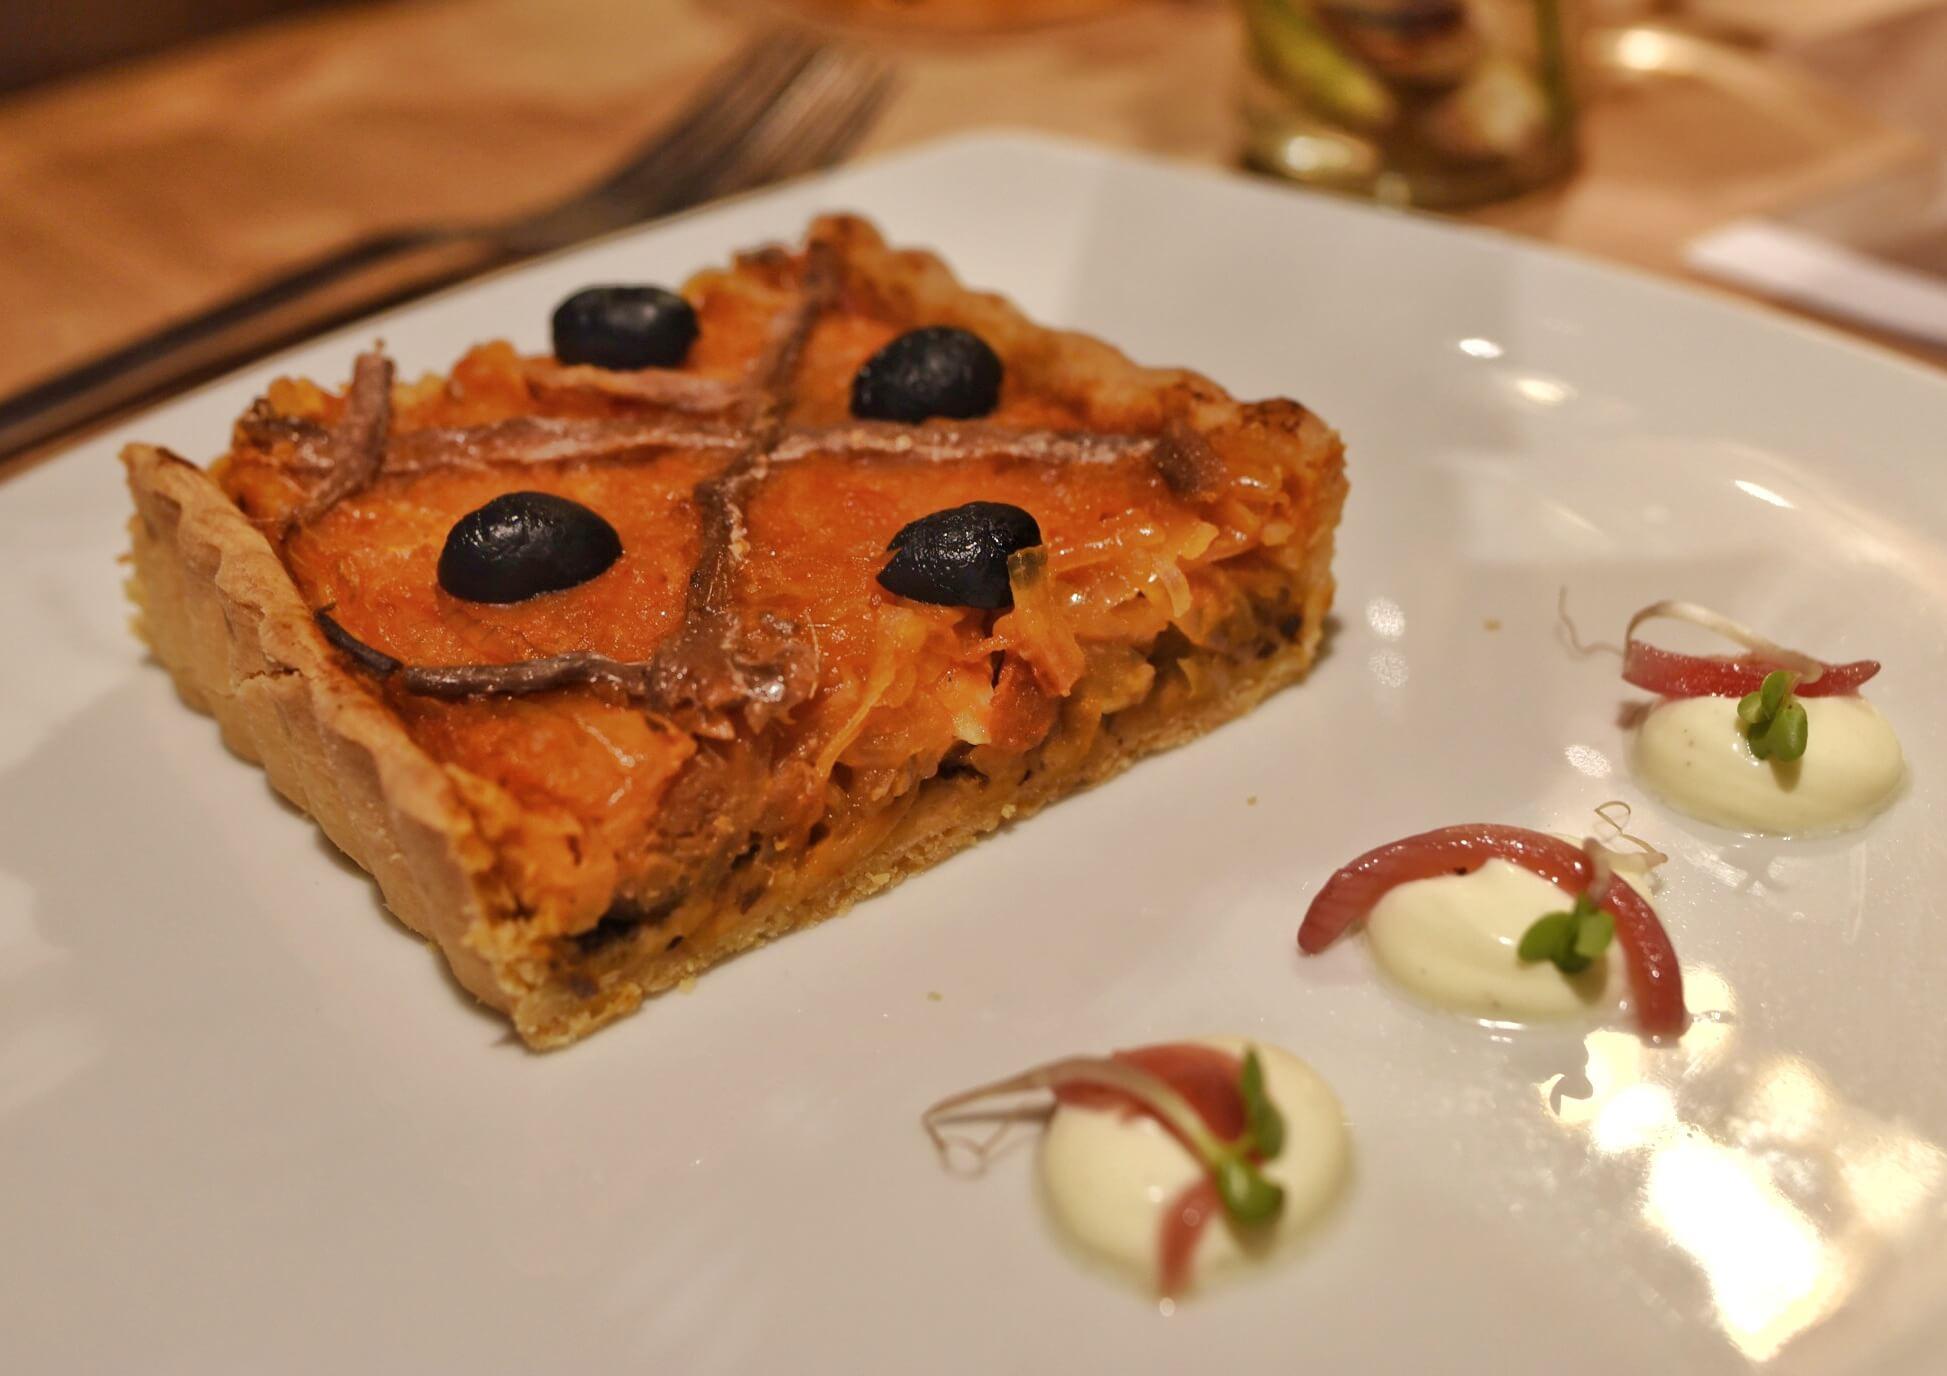 Monis provenzalische Tarte Pissaladière